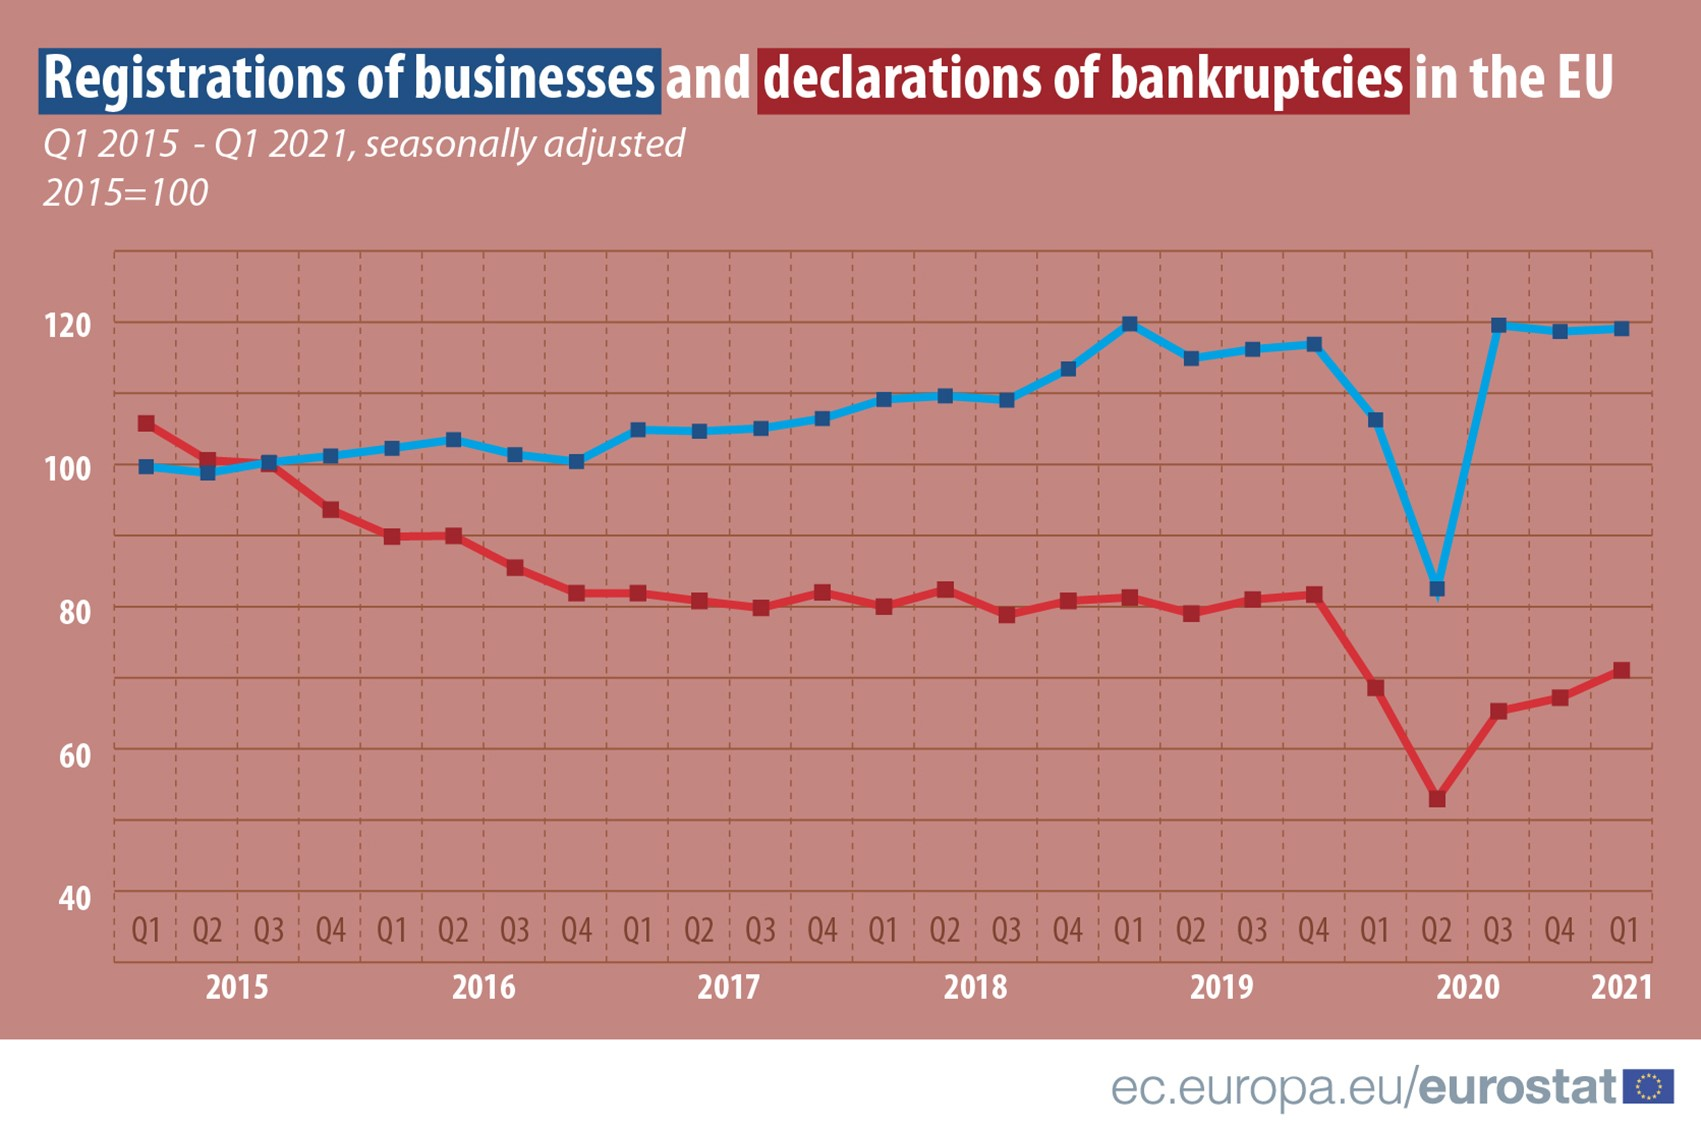 New businesses_Bankruptcies